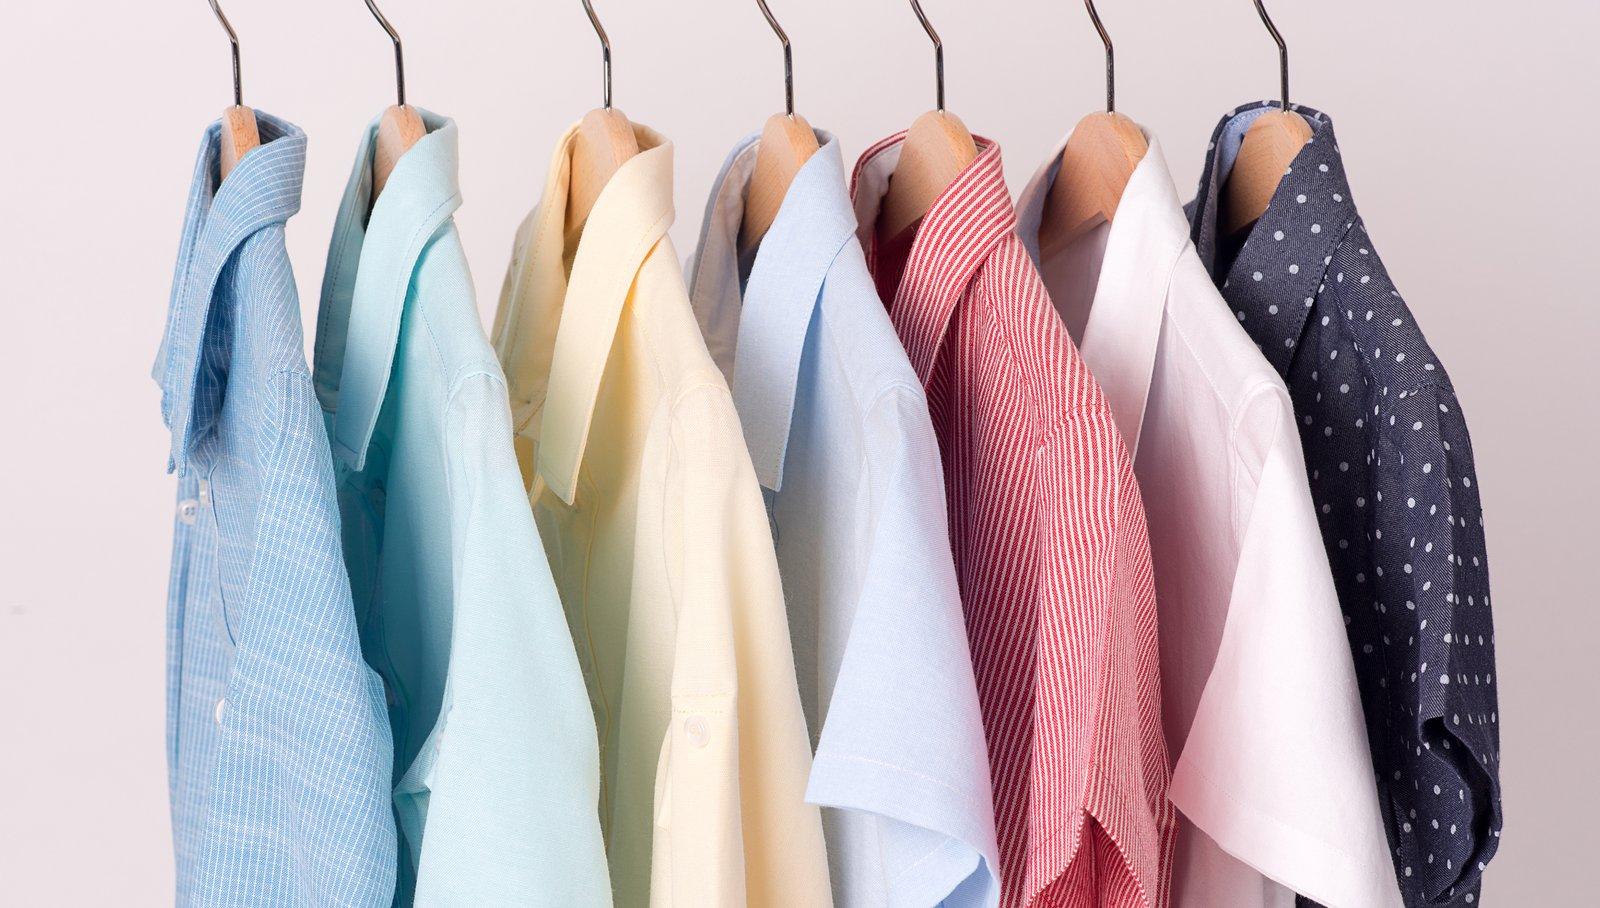 background of shirts hanging on hanger.